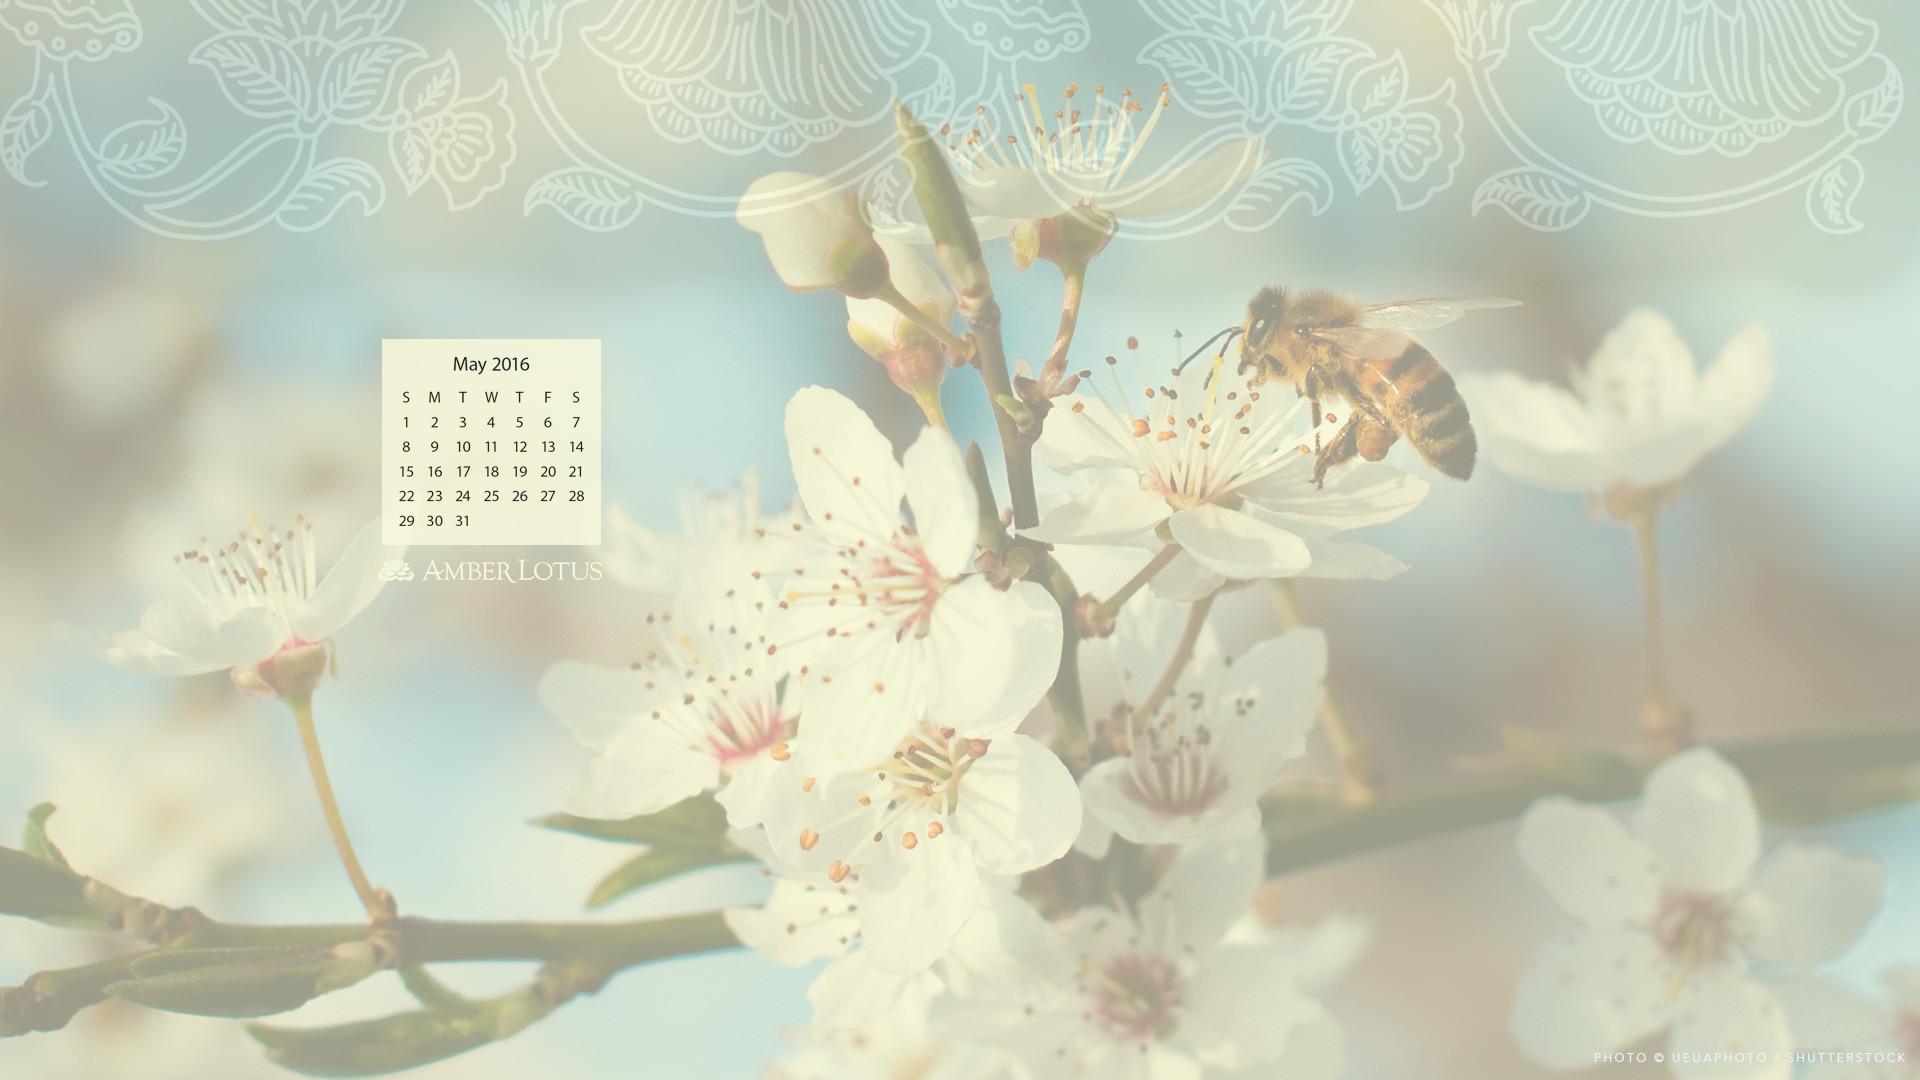 March 2018 Cute Full Screen Desktop Wallpapers May 2018 Desktop Calendar Wallpaper 60 Images